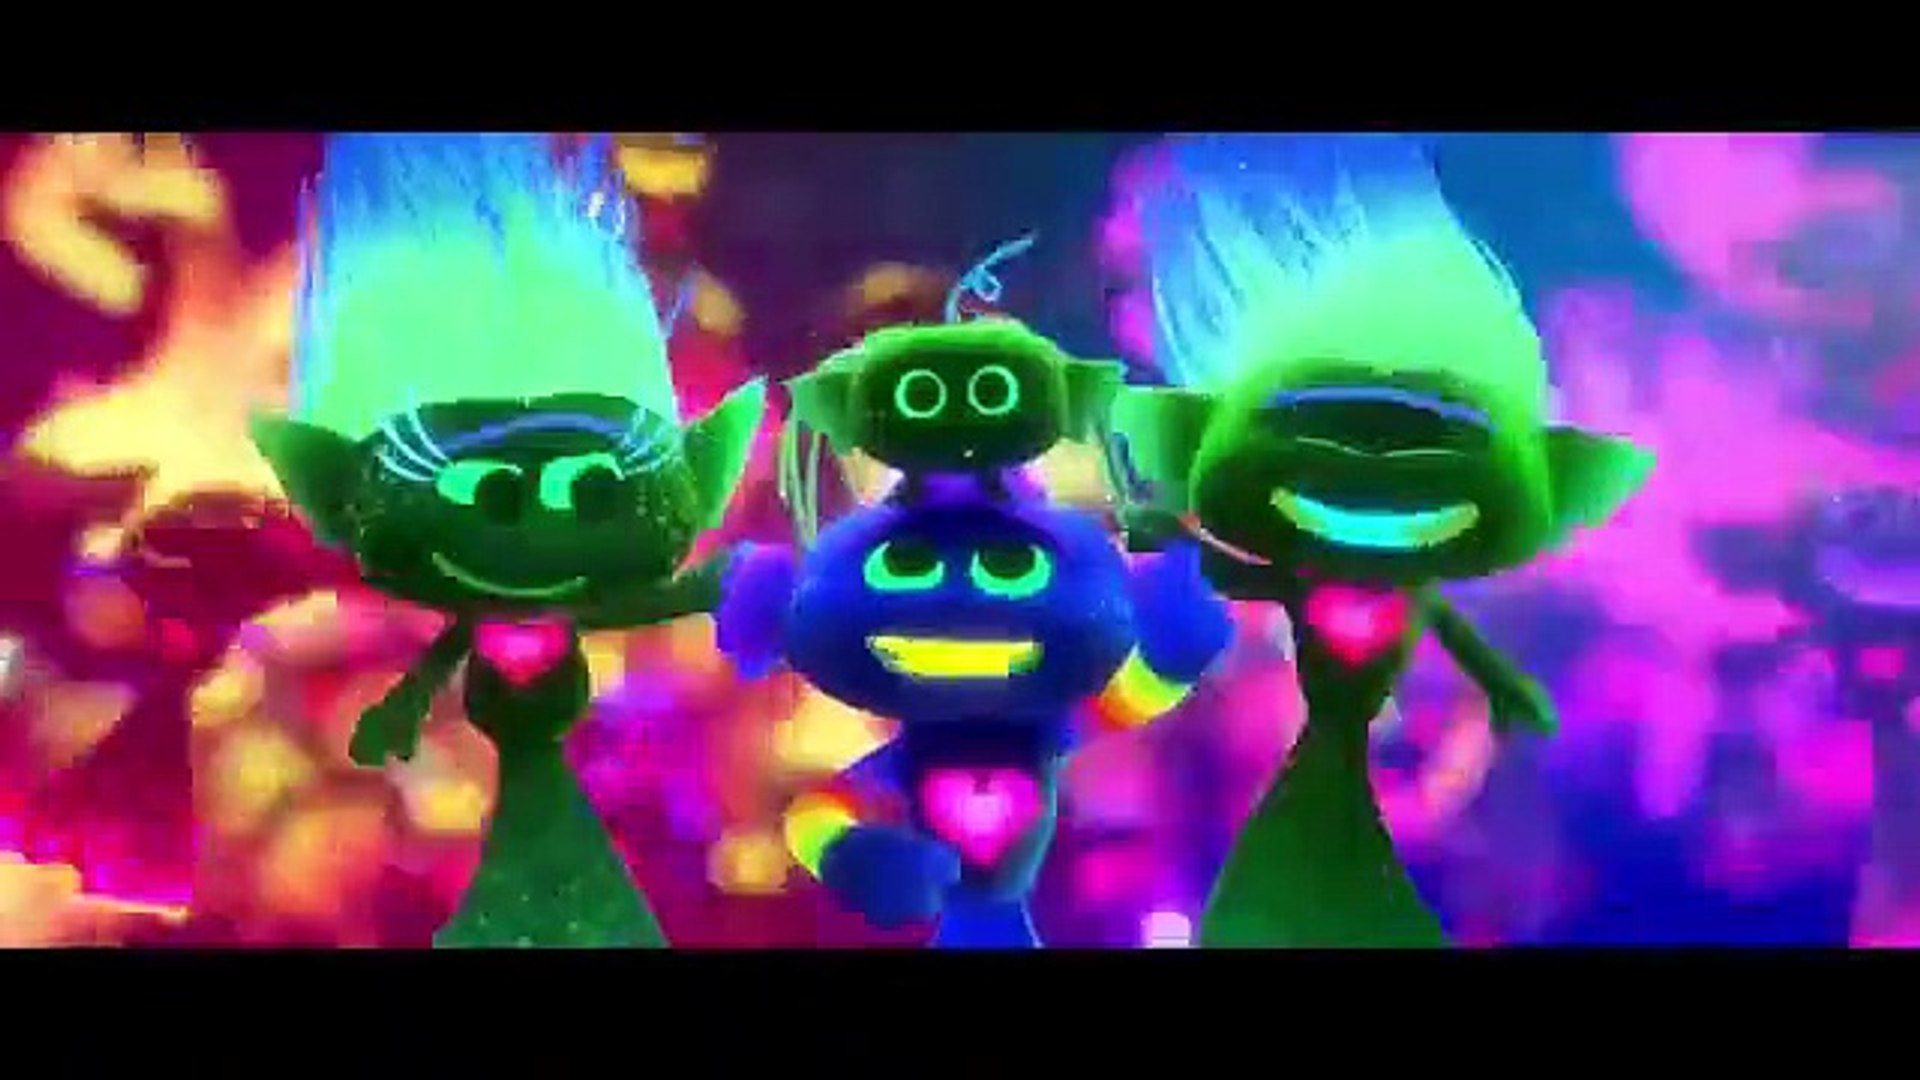 TROLLS 2 Trailer - 2 (NEW 2020) Trolls World Tour, Animation Movie HD